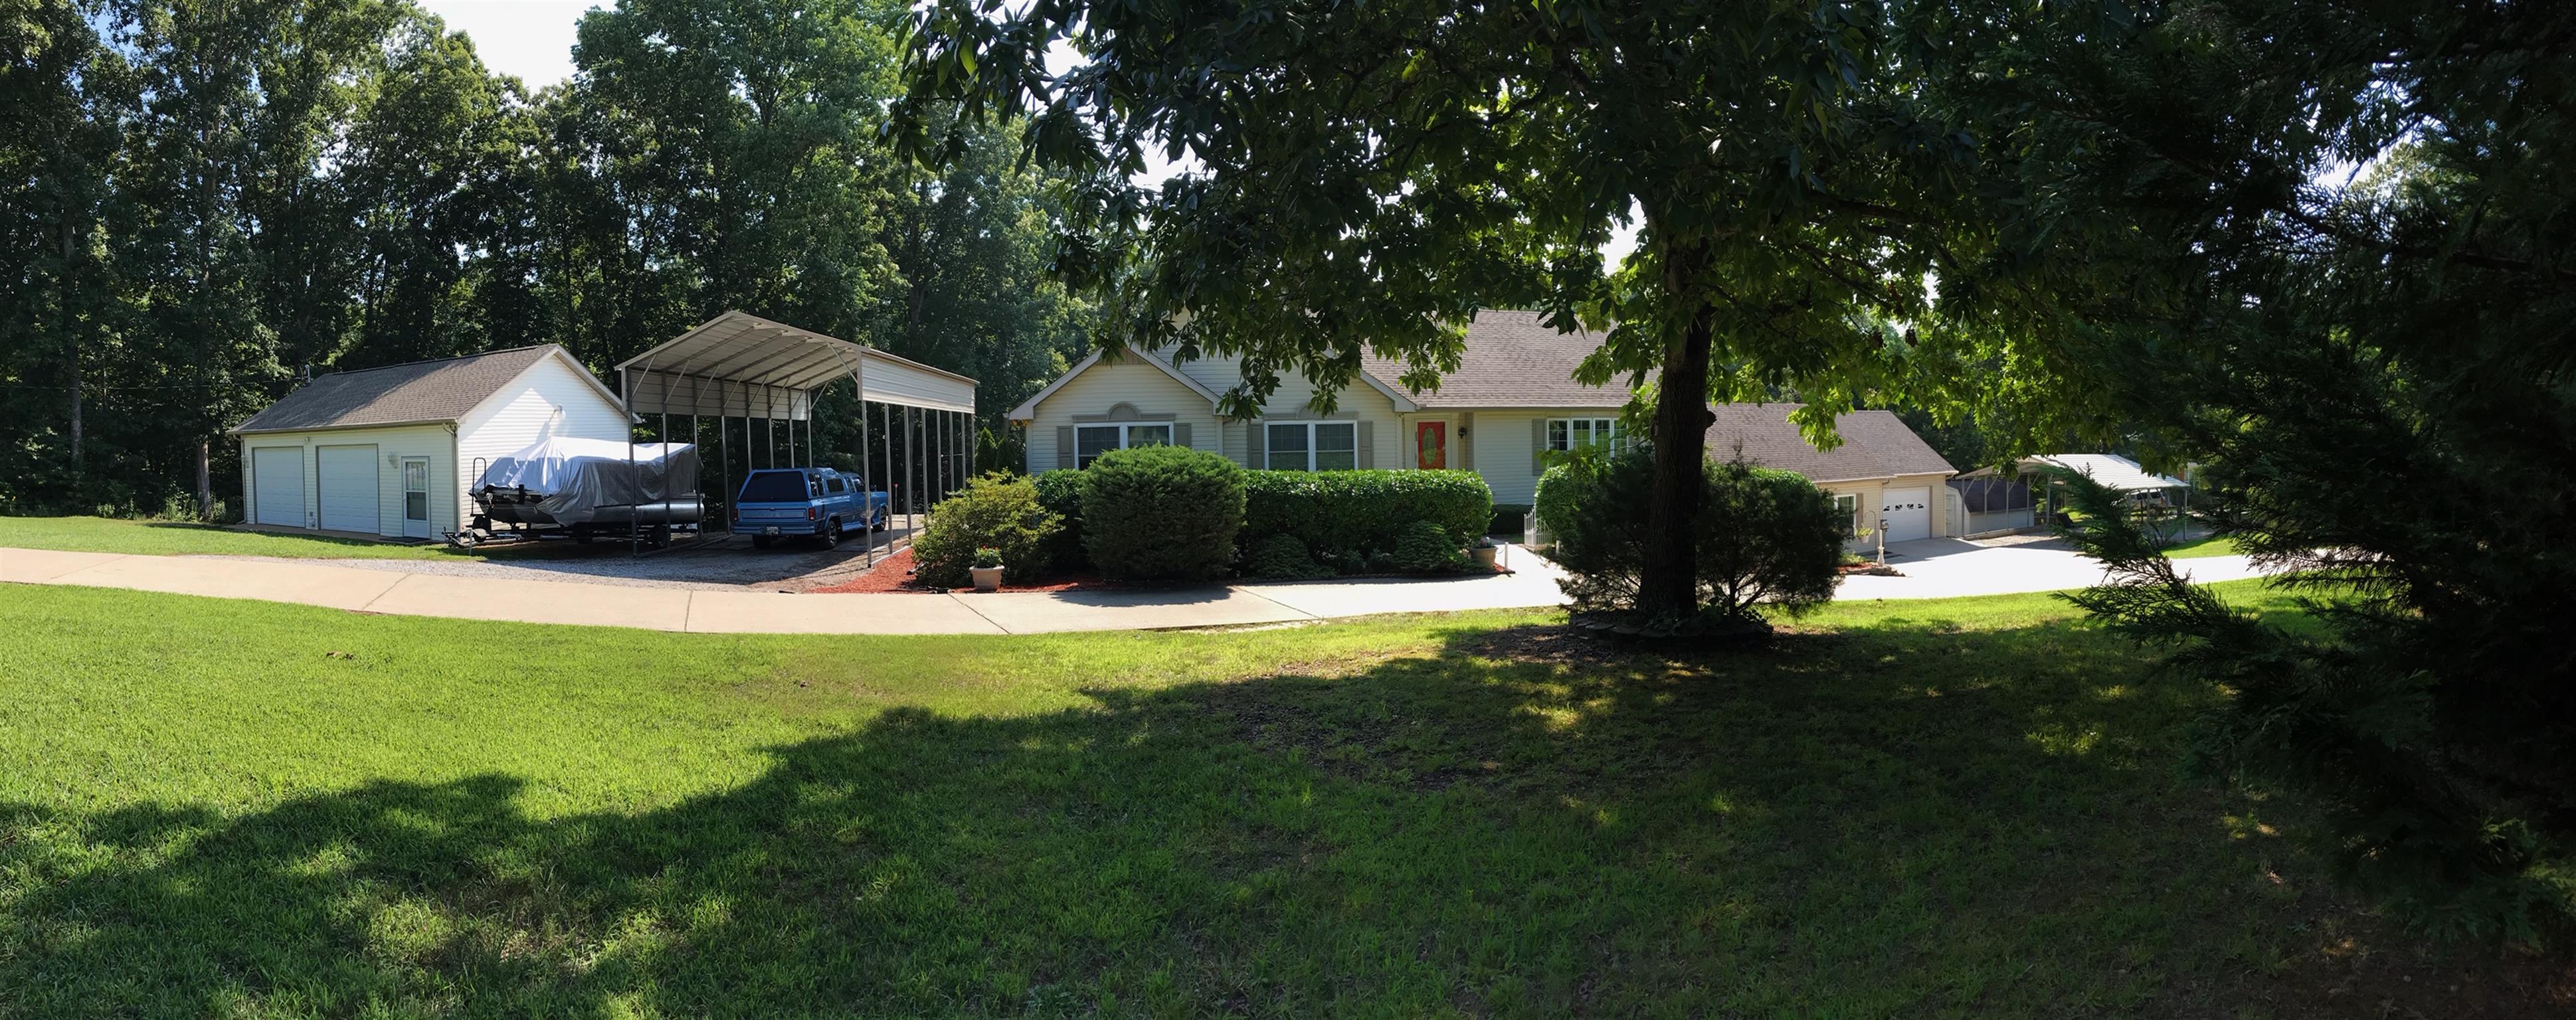 252 Rouse Rd, Dickson, TN 37055 - Dickson, TN real estate listing